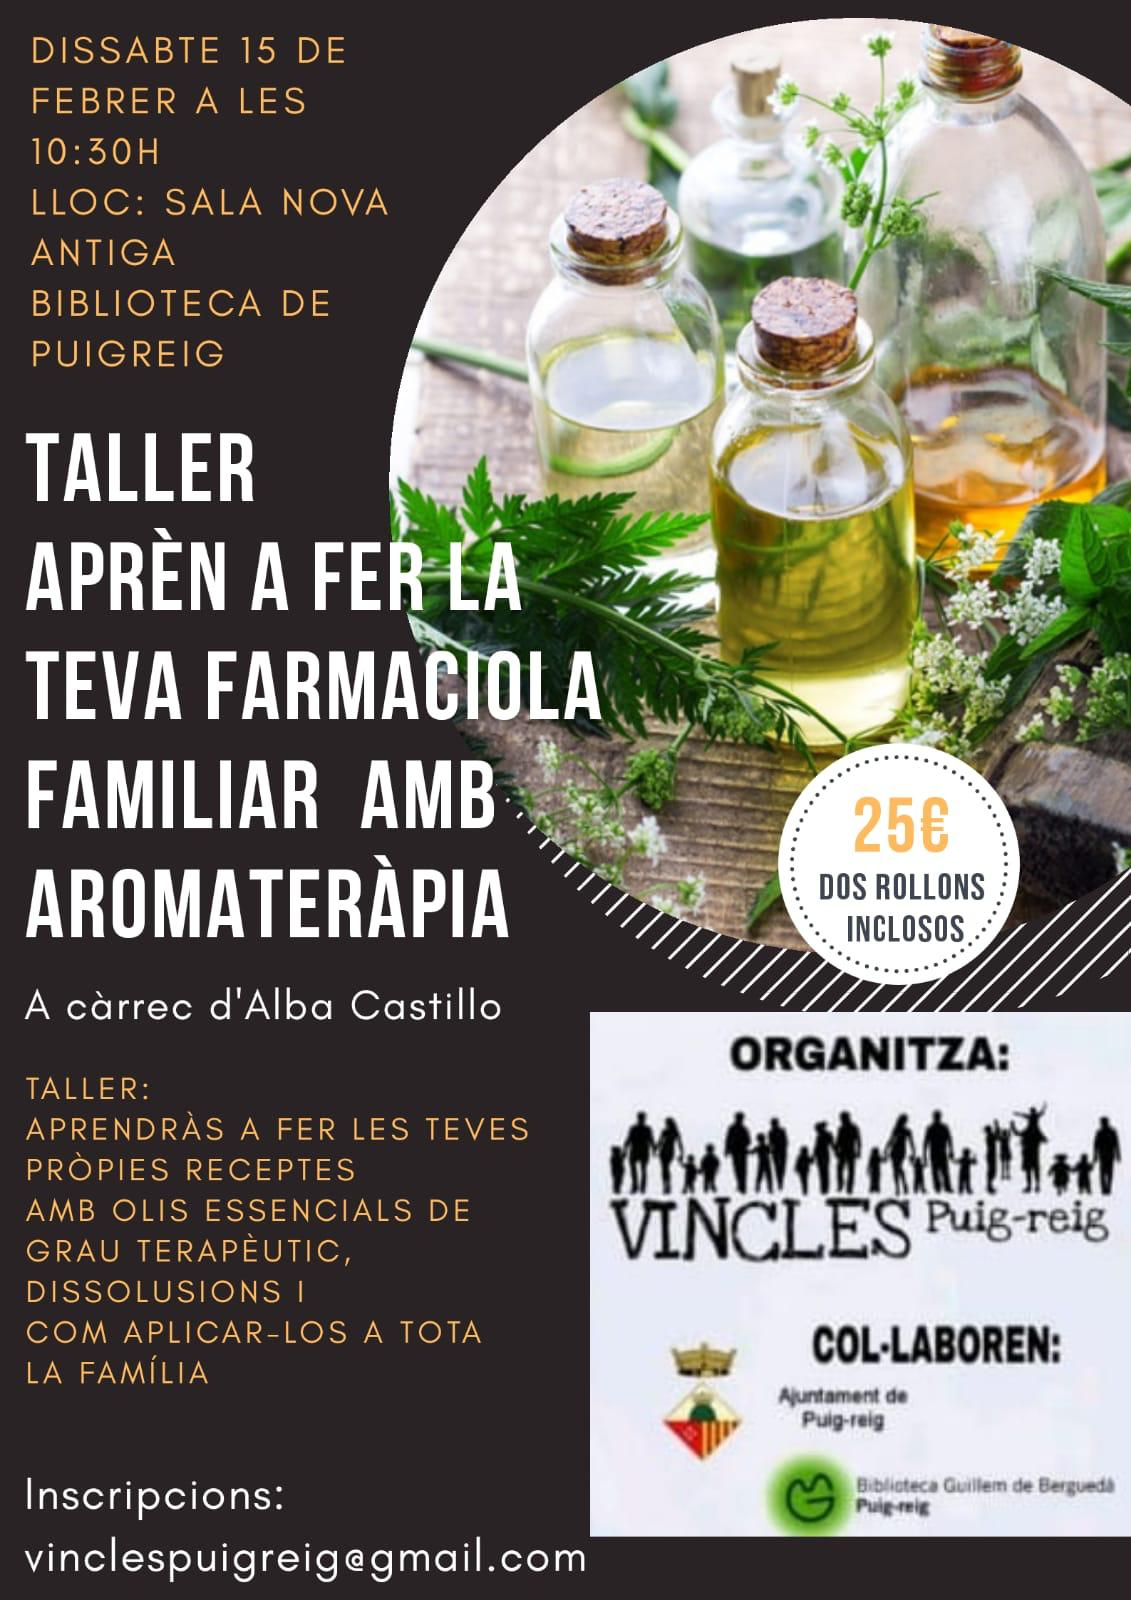 farmaciola aromaterapia